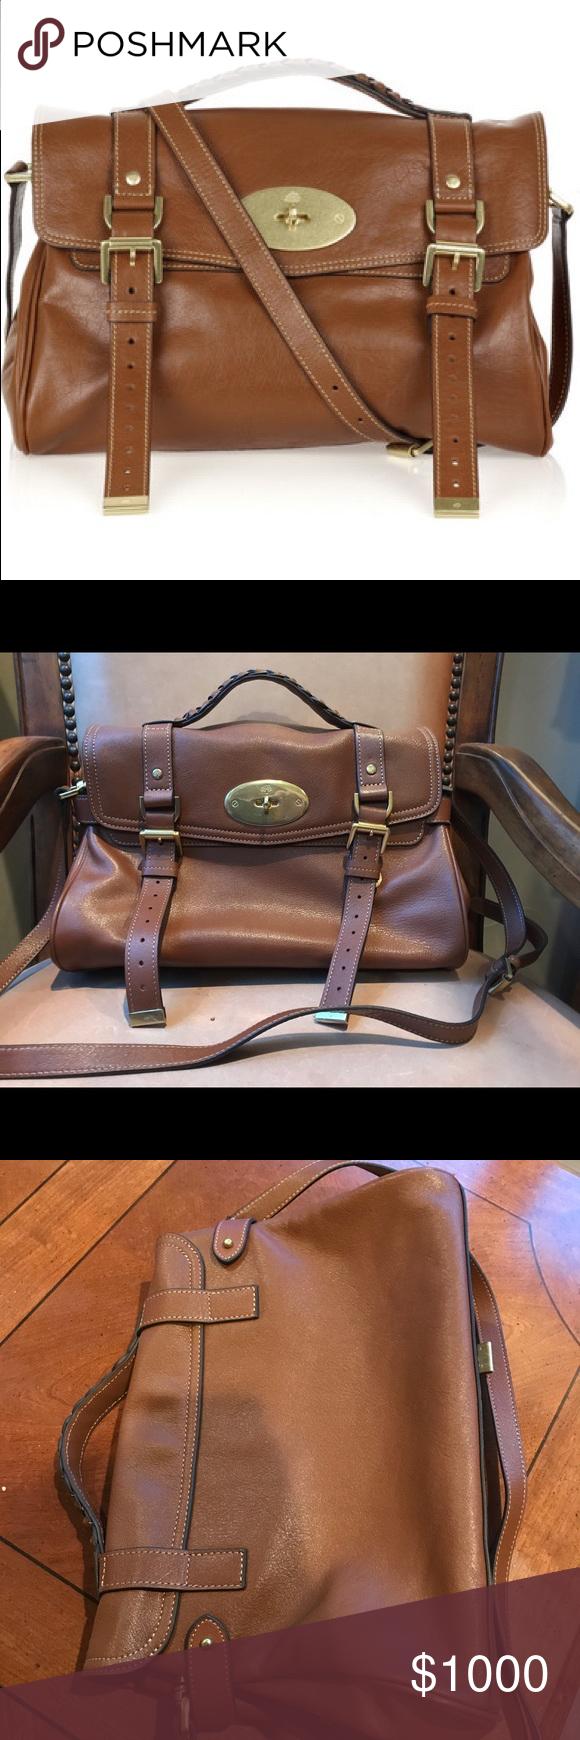 0285ada3f4 Mulberry Alexa Handbag Brand new without tags-never worn! Rare